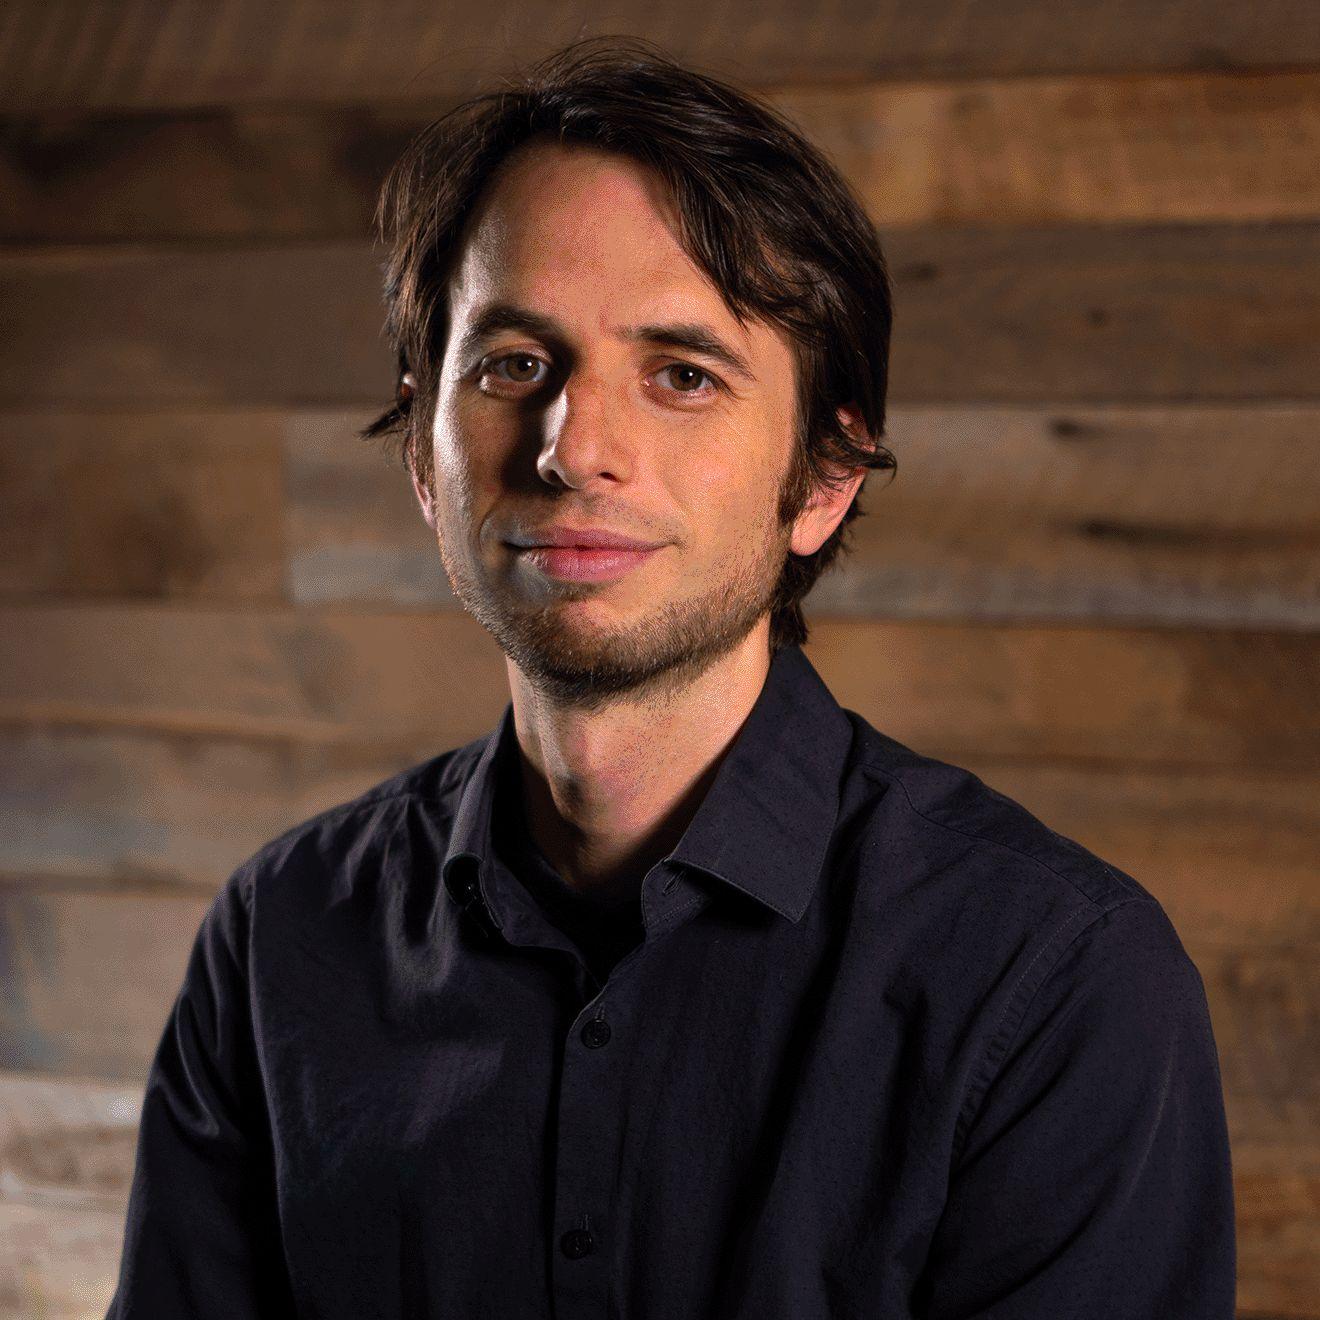 Brandon Heller